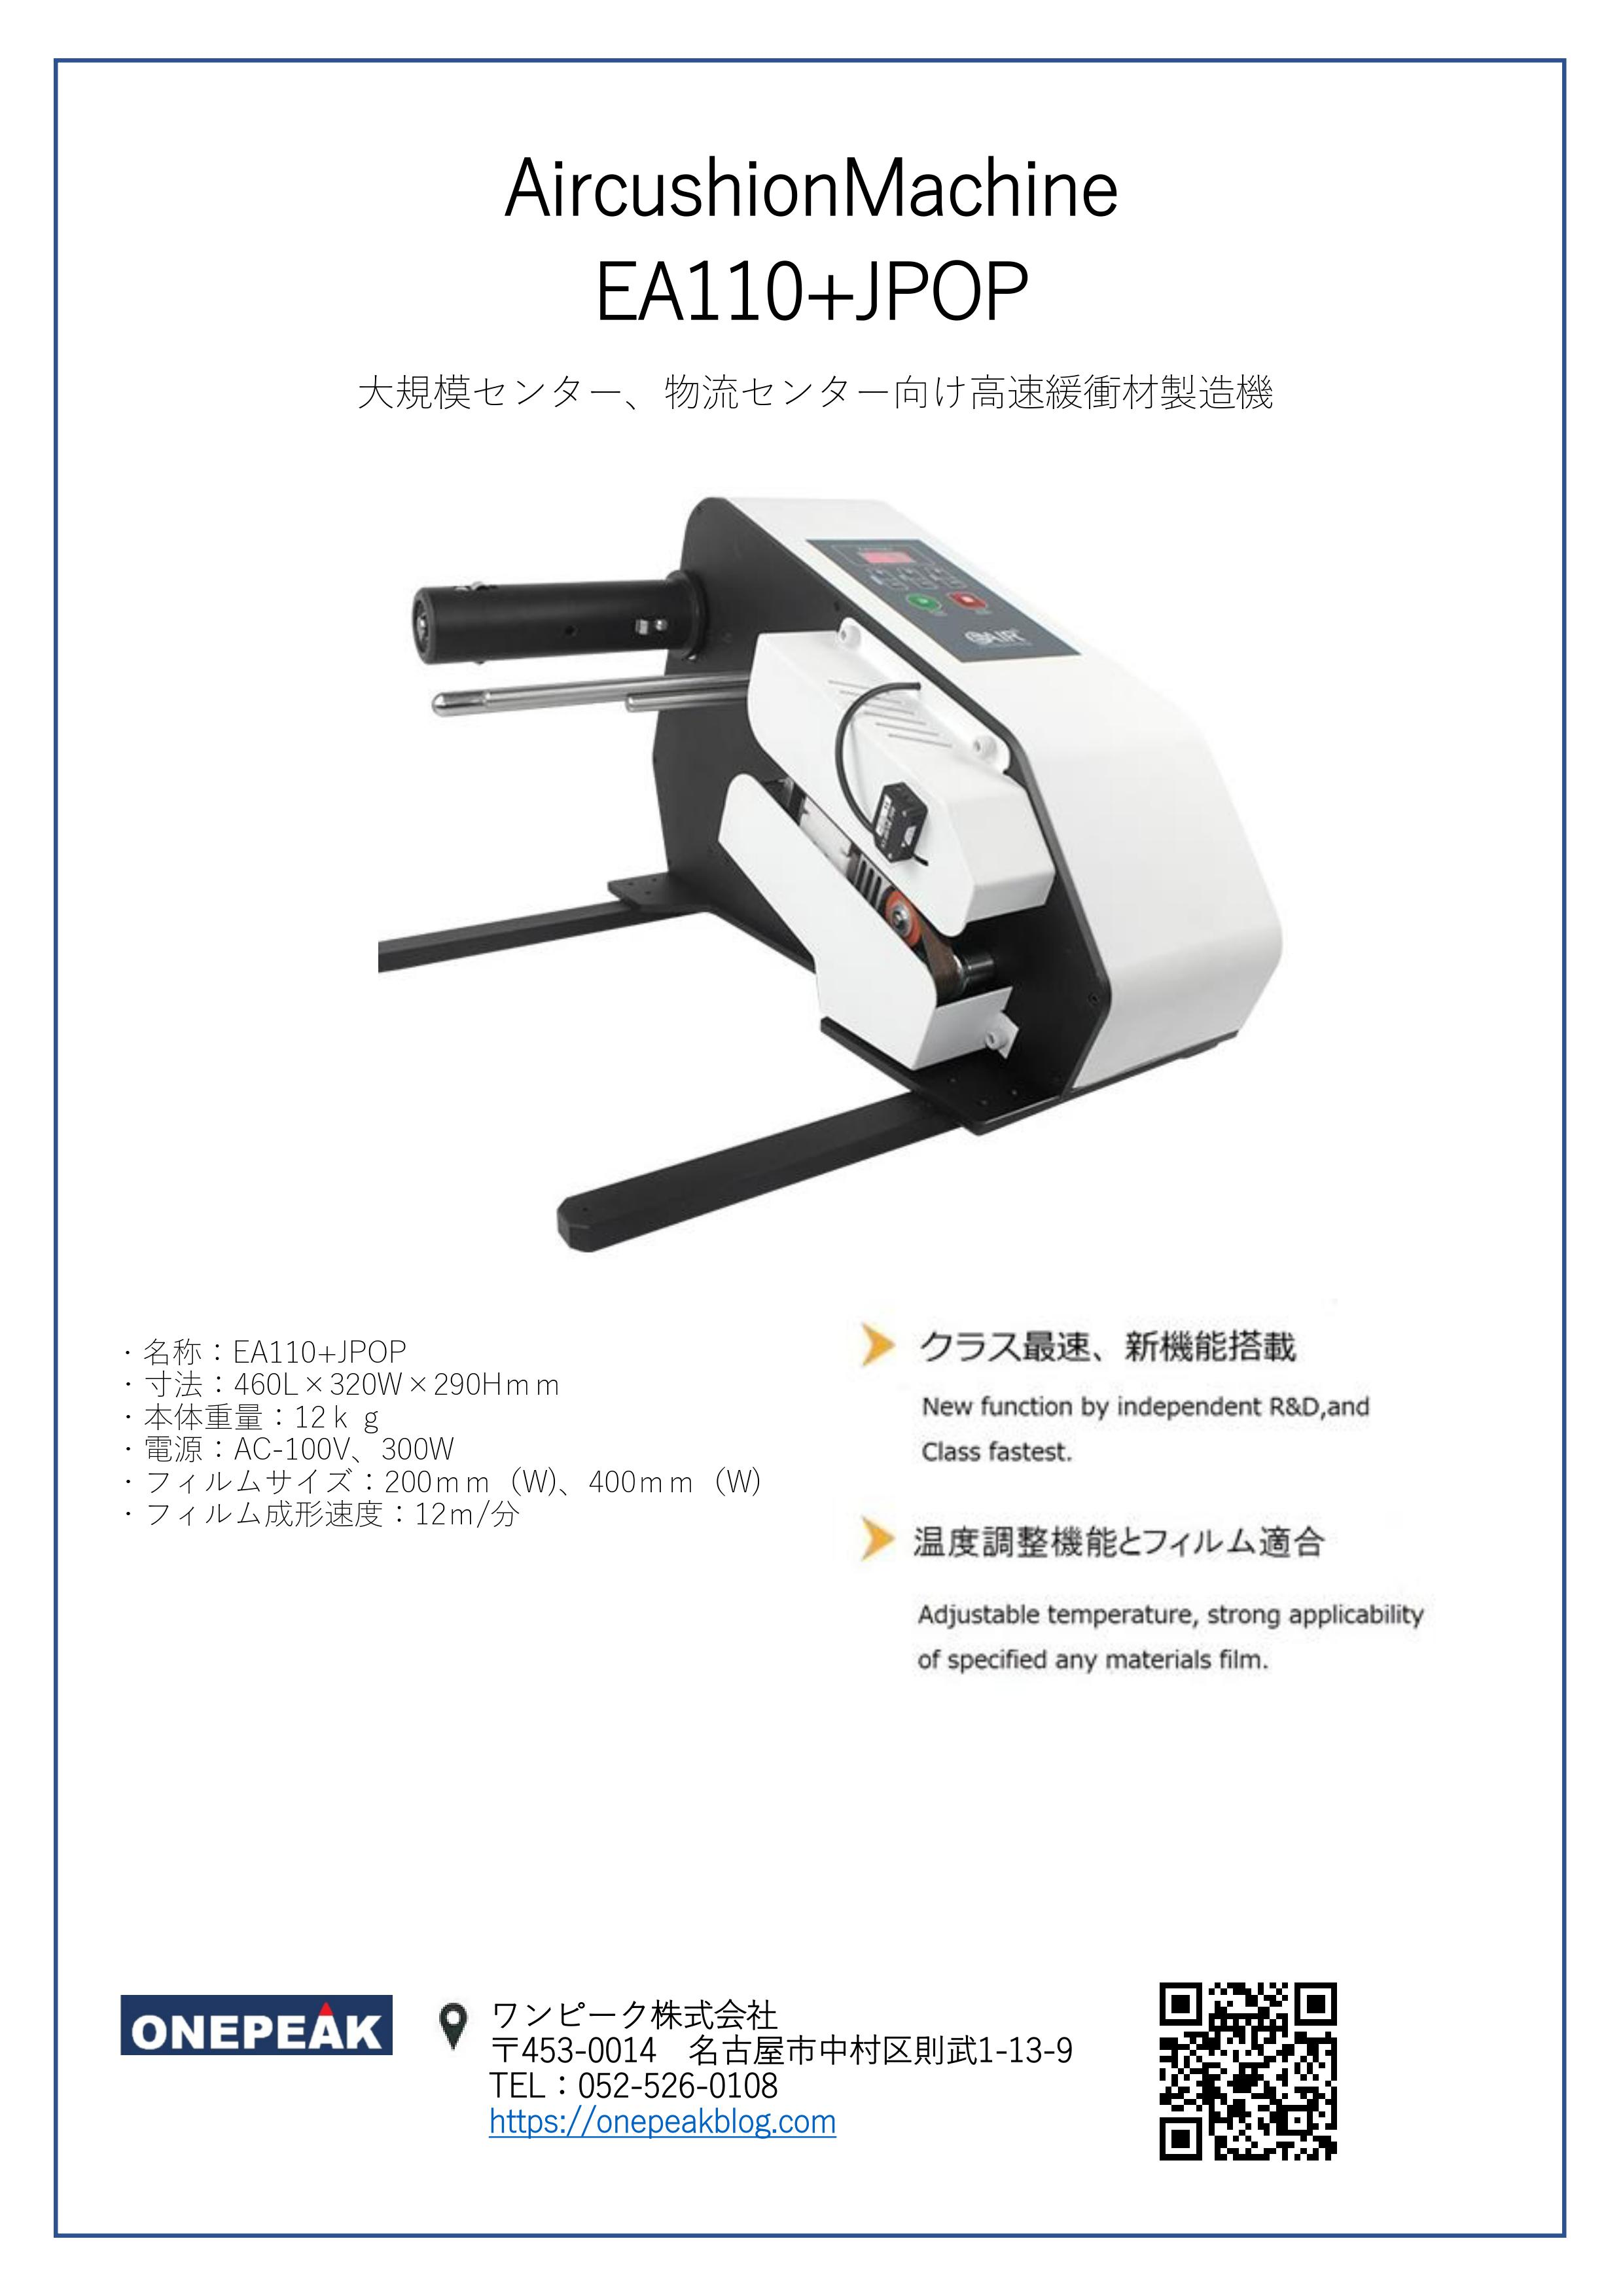 EA110+ カタログ表1